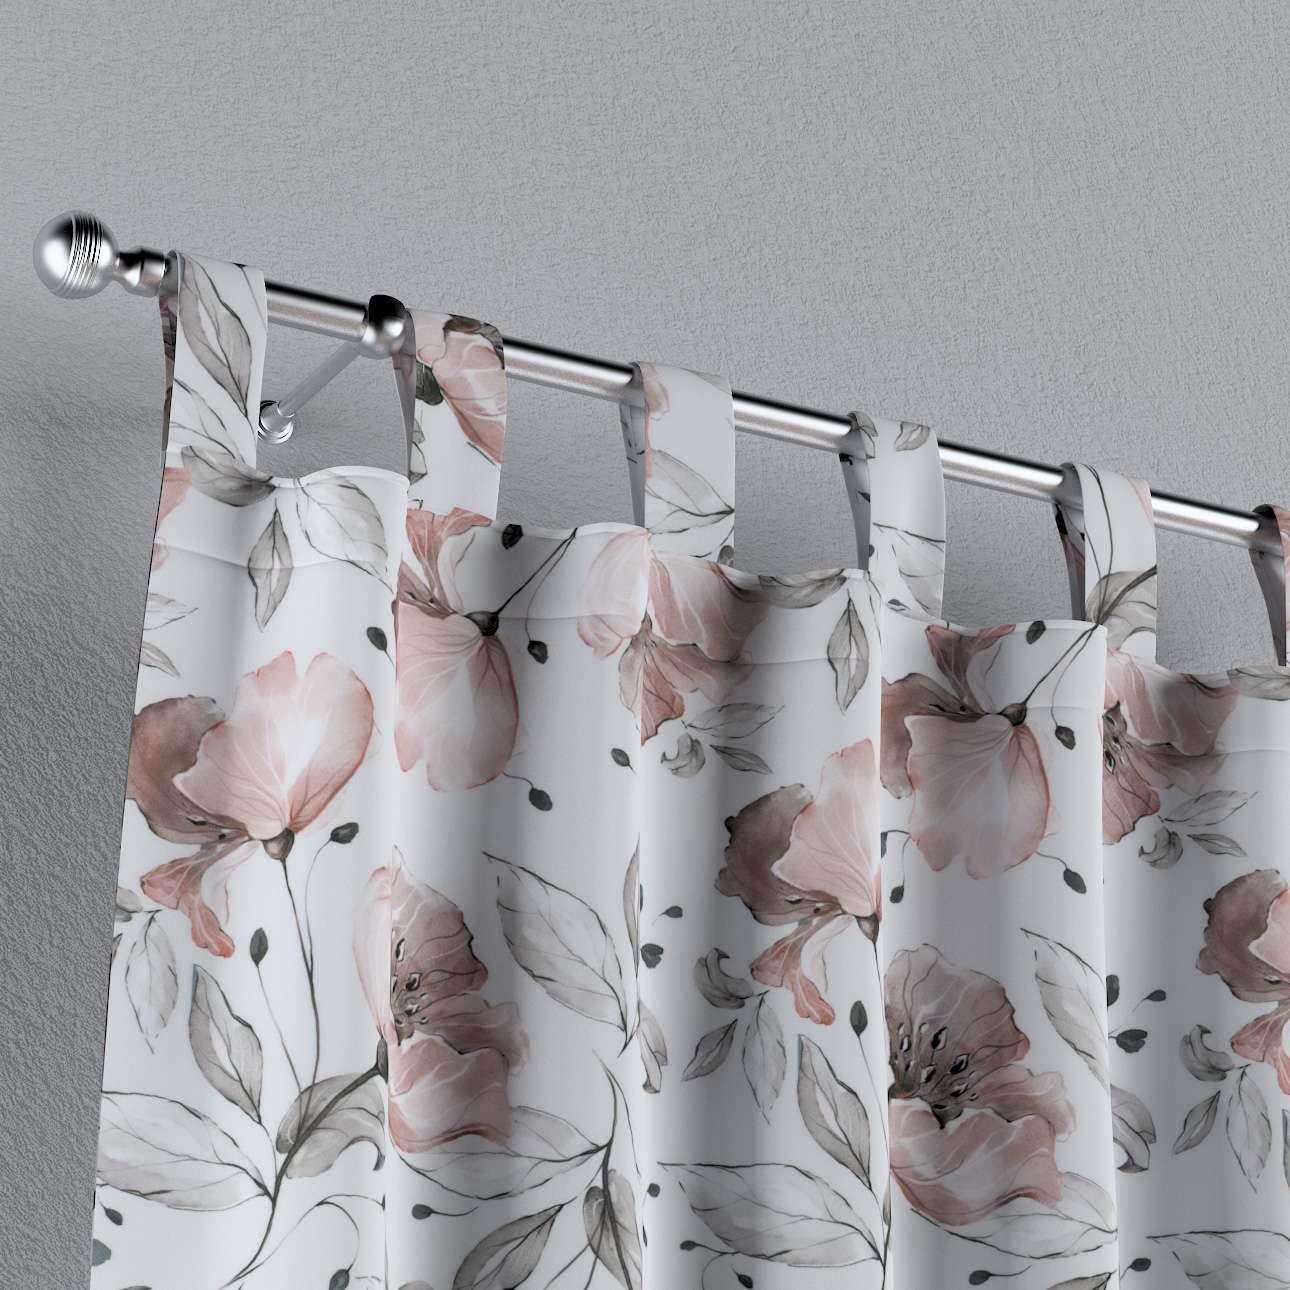 Záves na pútkach V kolekcii Velvet, tkanina: 704-50